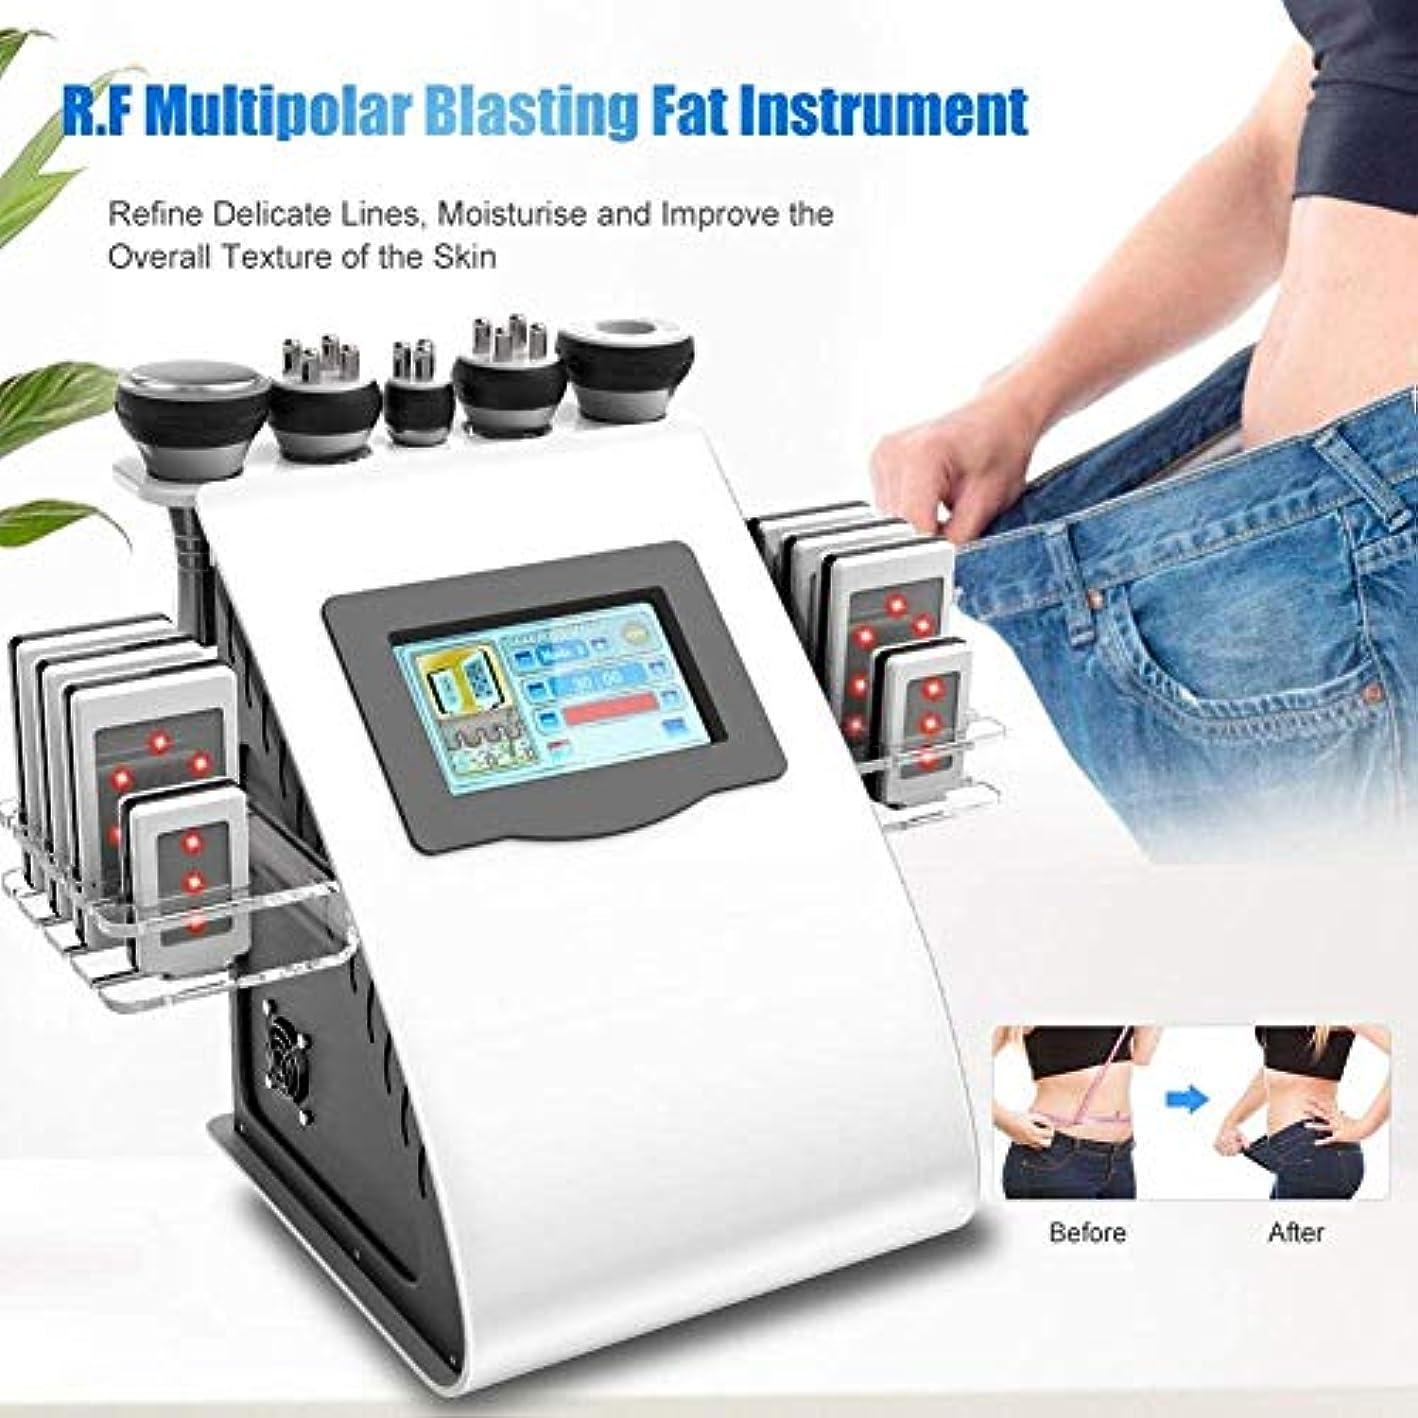 5 in 1 ボディシェイピング 脂肪燃焼 機械、 美人 ケア デバイス マッサージャー、 プロ 顔と体 Slim身 処理 デバイス 機械